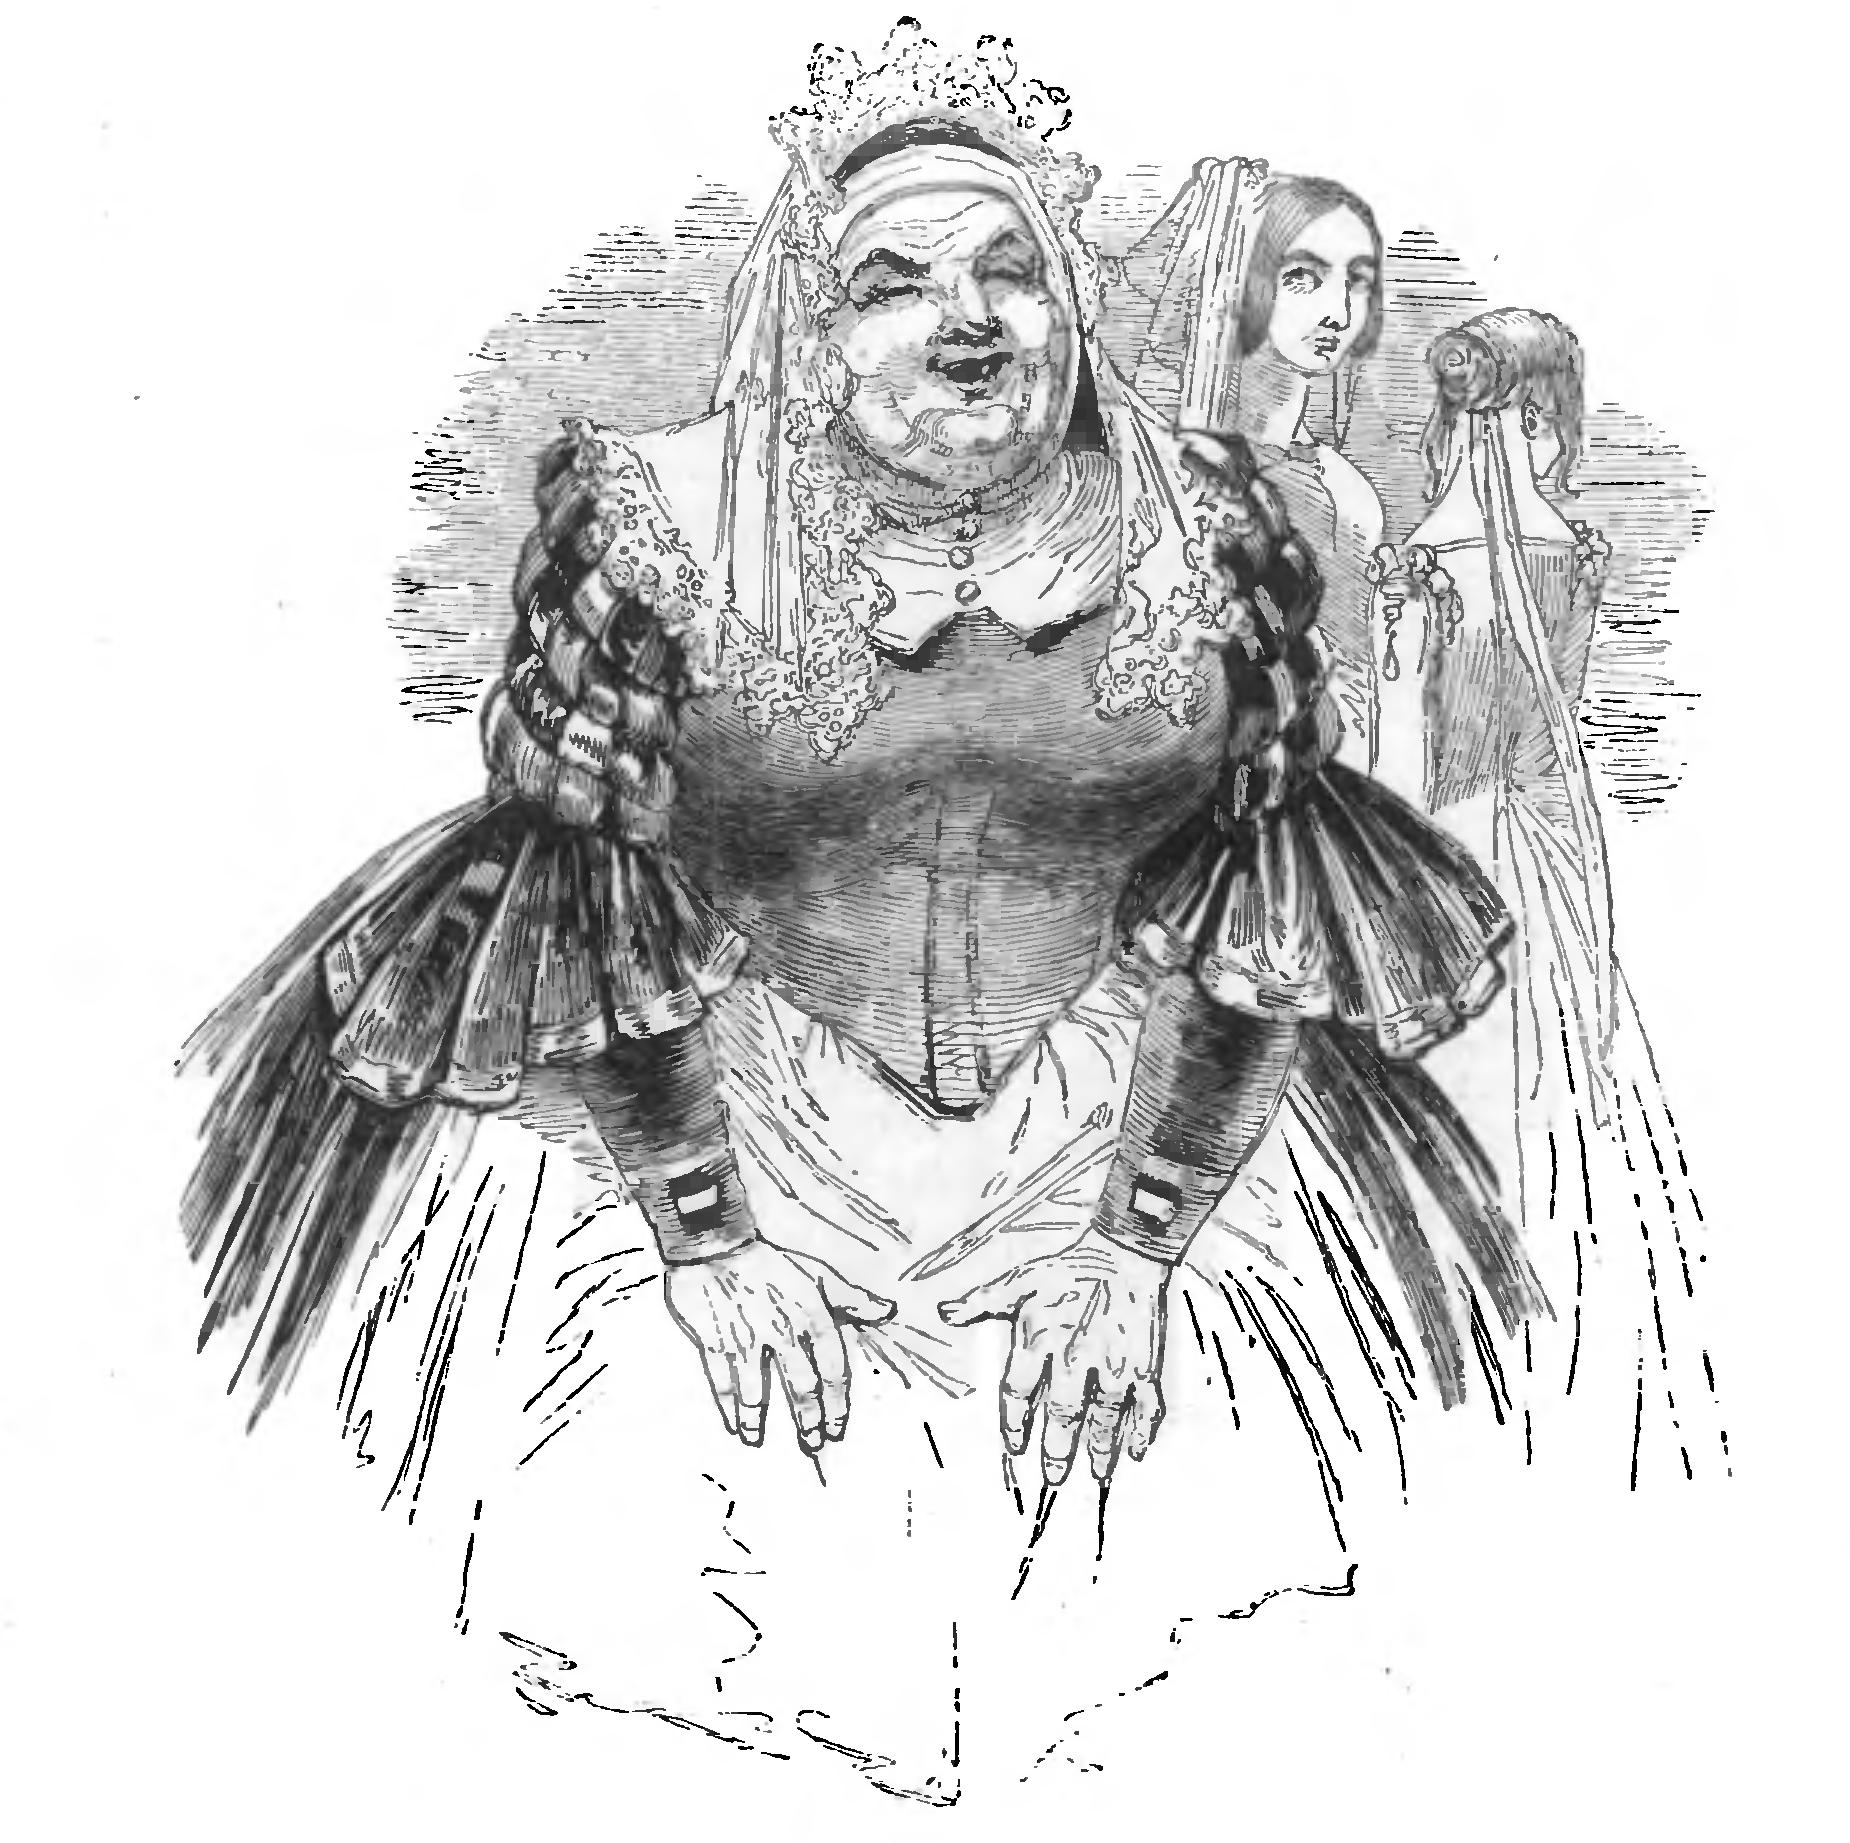 Drawn quoth shakespeare Genius Act Shakespeare Juliet Scene